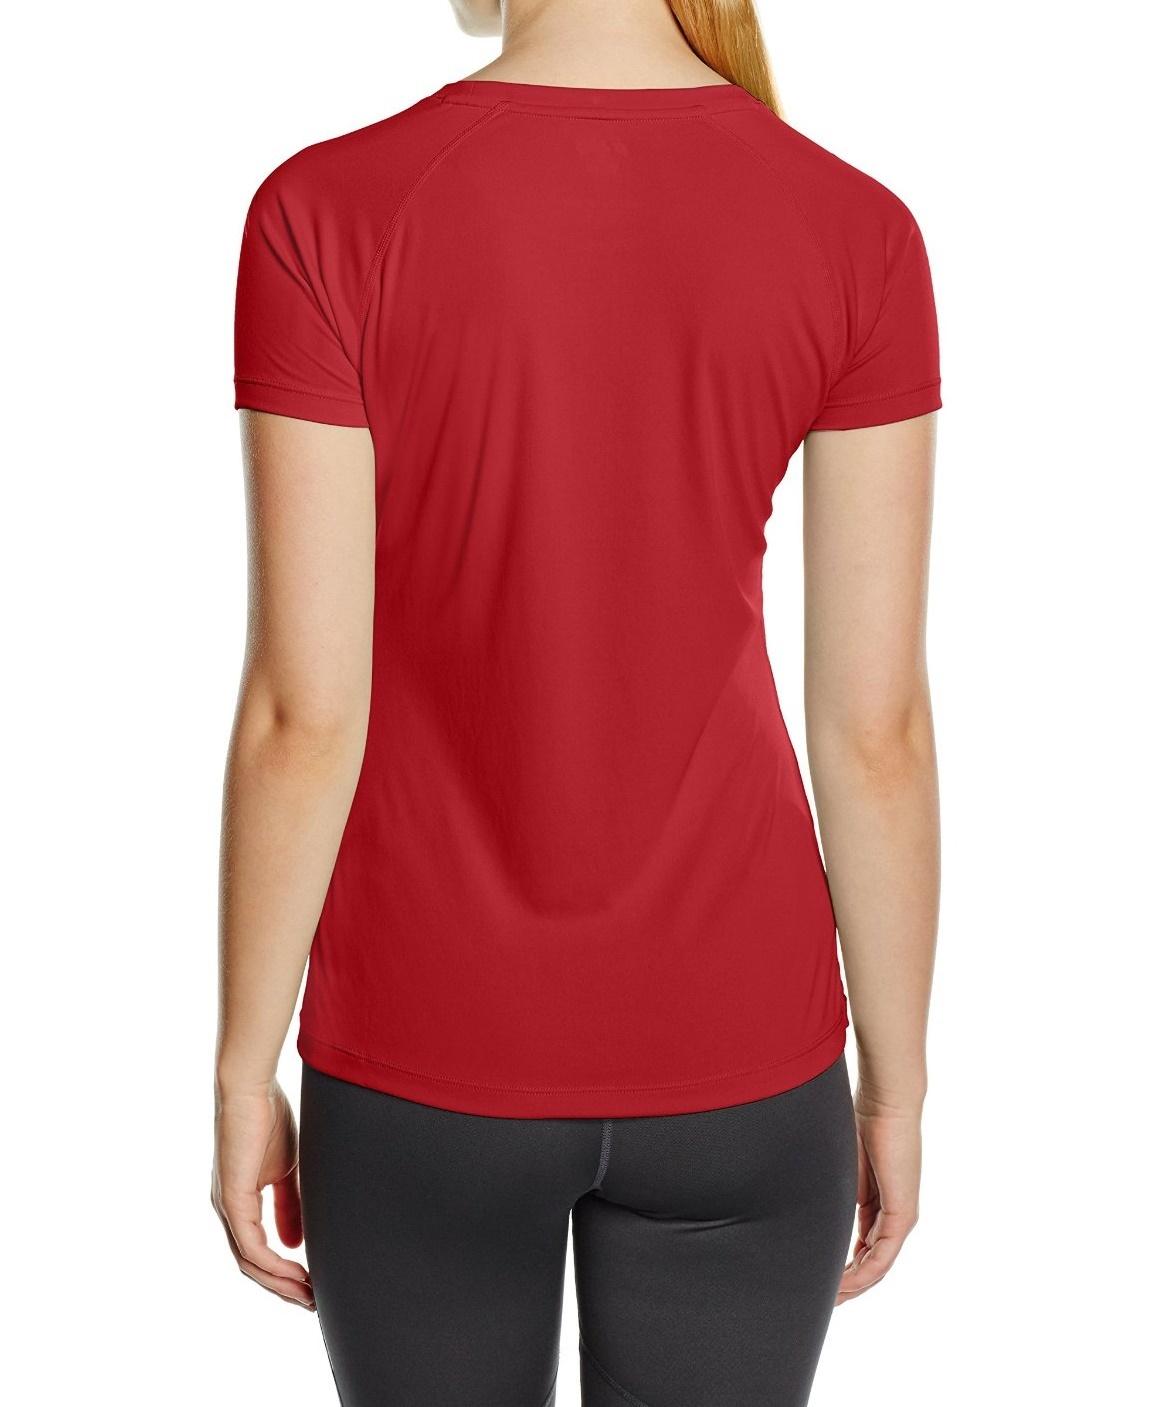 Женская футболка для бега асикс  Stripe SS Top (126232 6010) красная